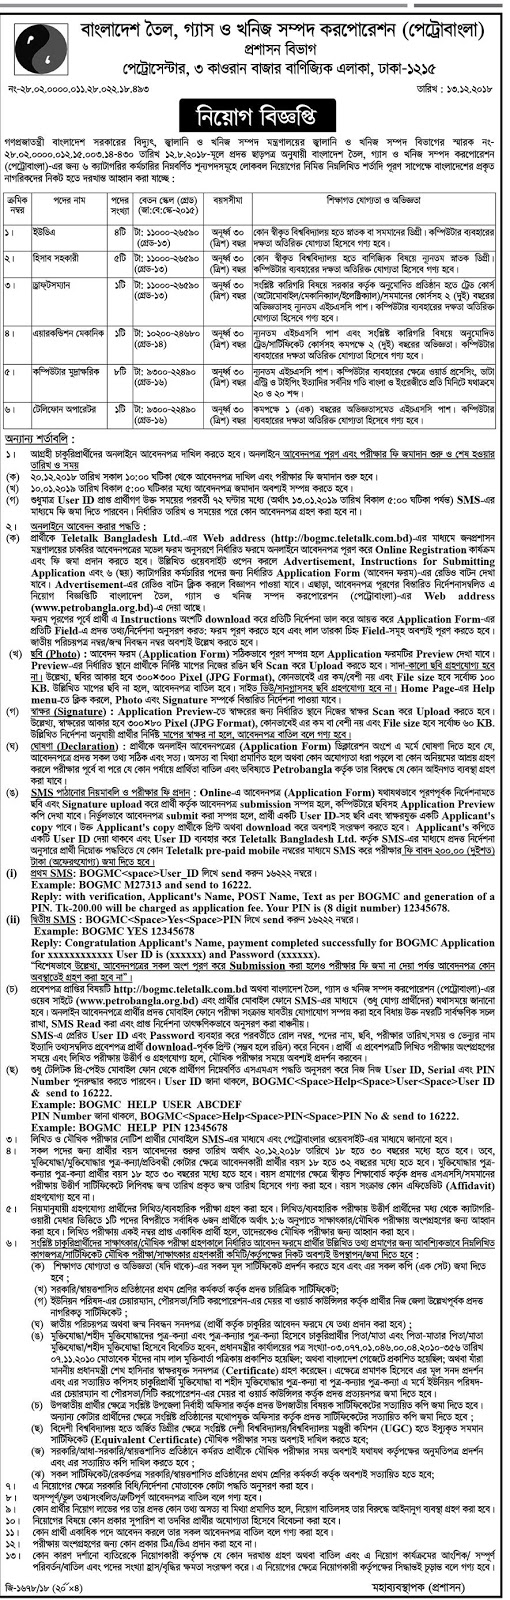 Bangladesh Minerals, Oil and Gas Corporation (BMOGC) Job Circular 2018